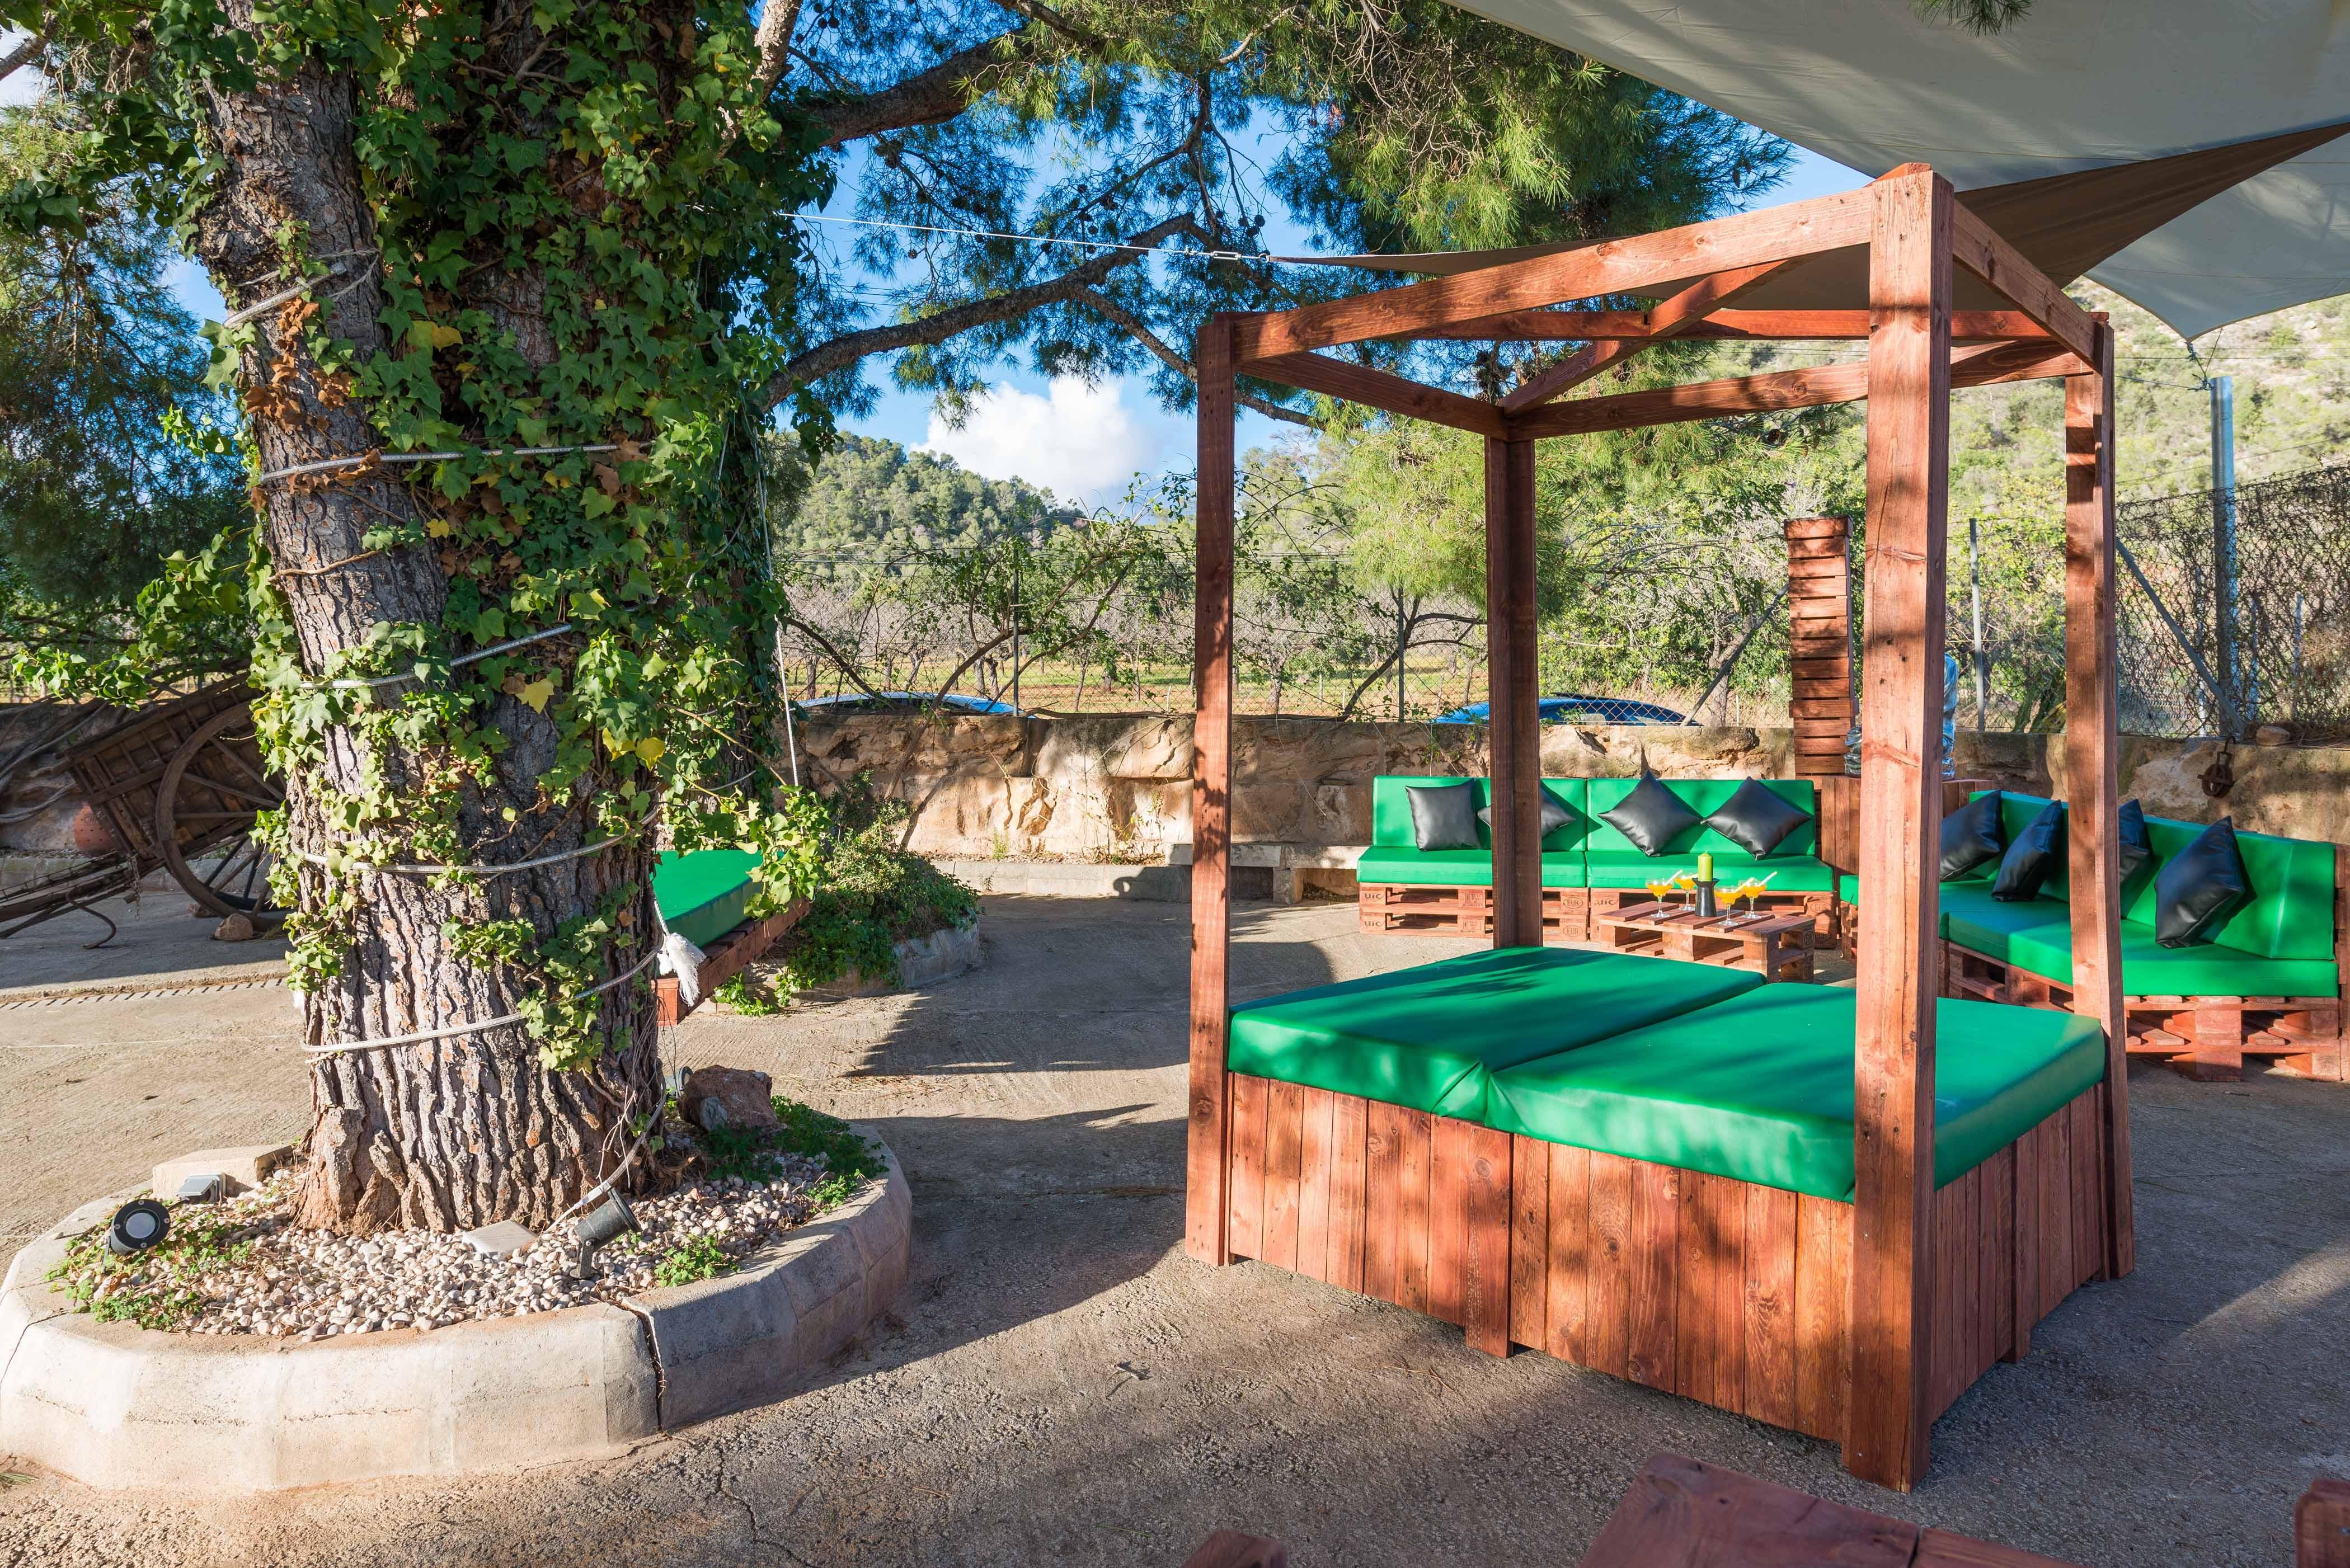 ferienhaus bunyola 7 personen spanien balearen 501834. Black Bedroom Furniture Sets. Home Design Ideas